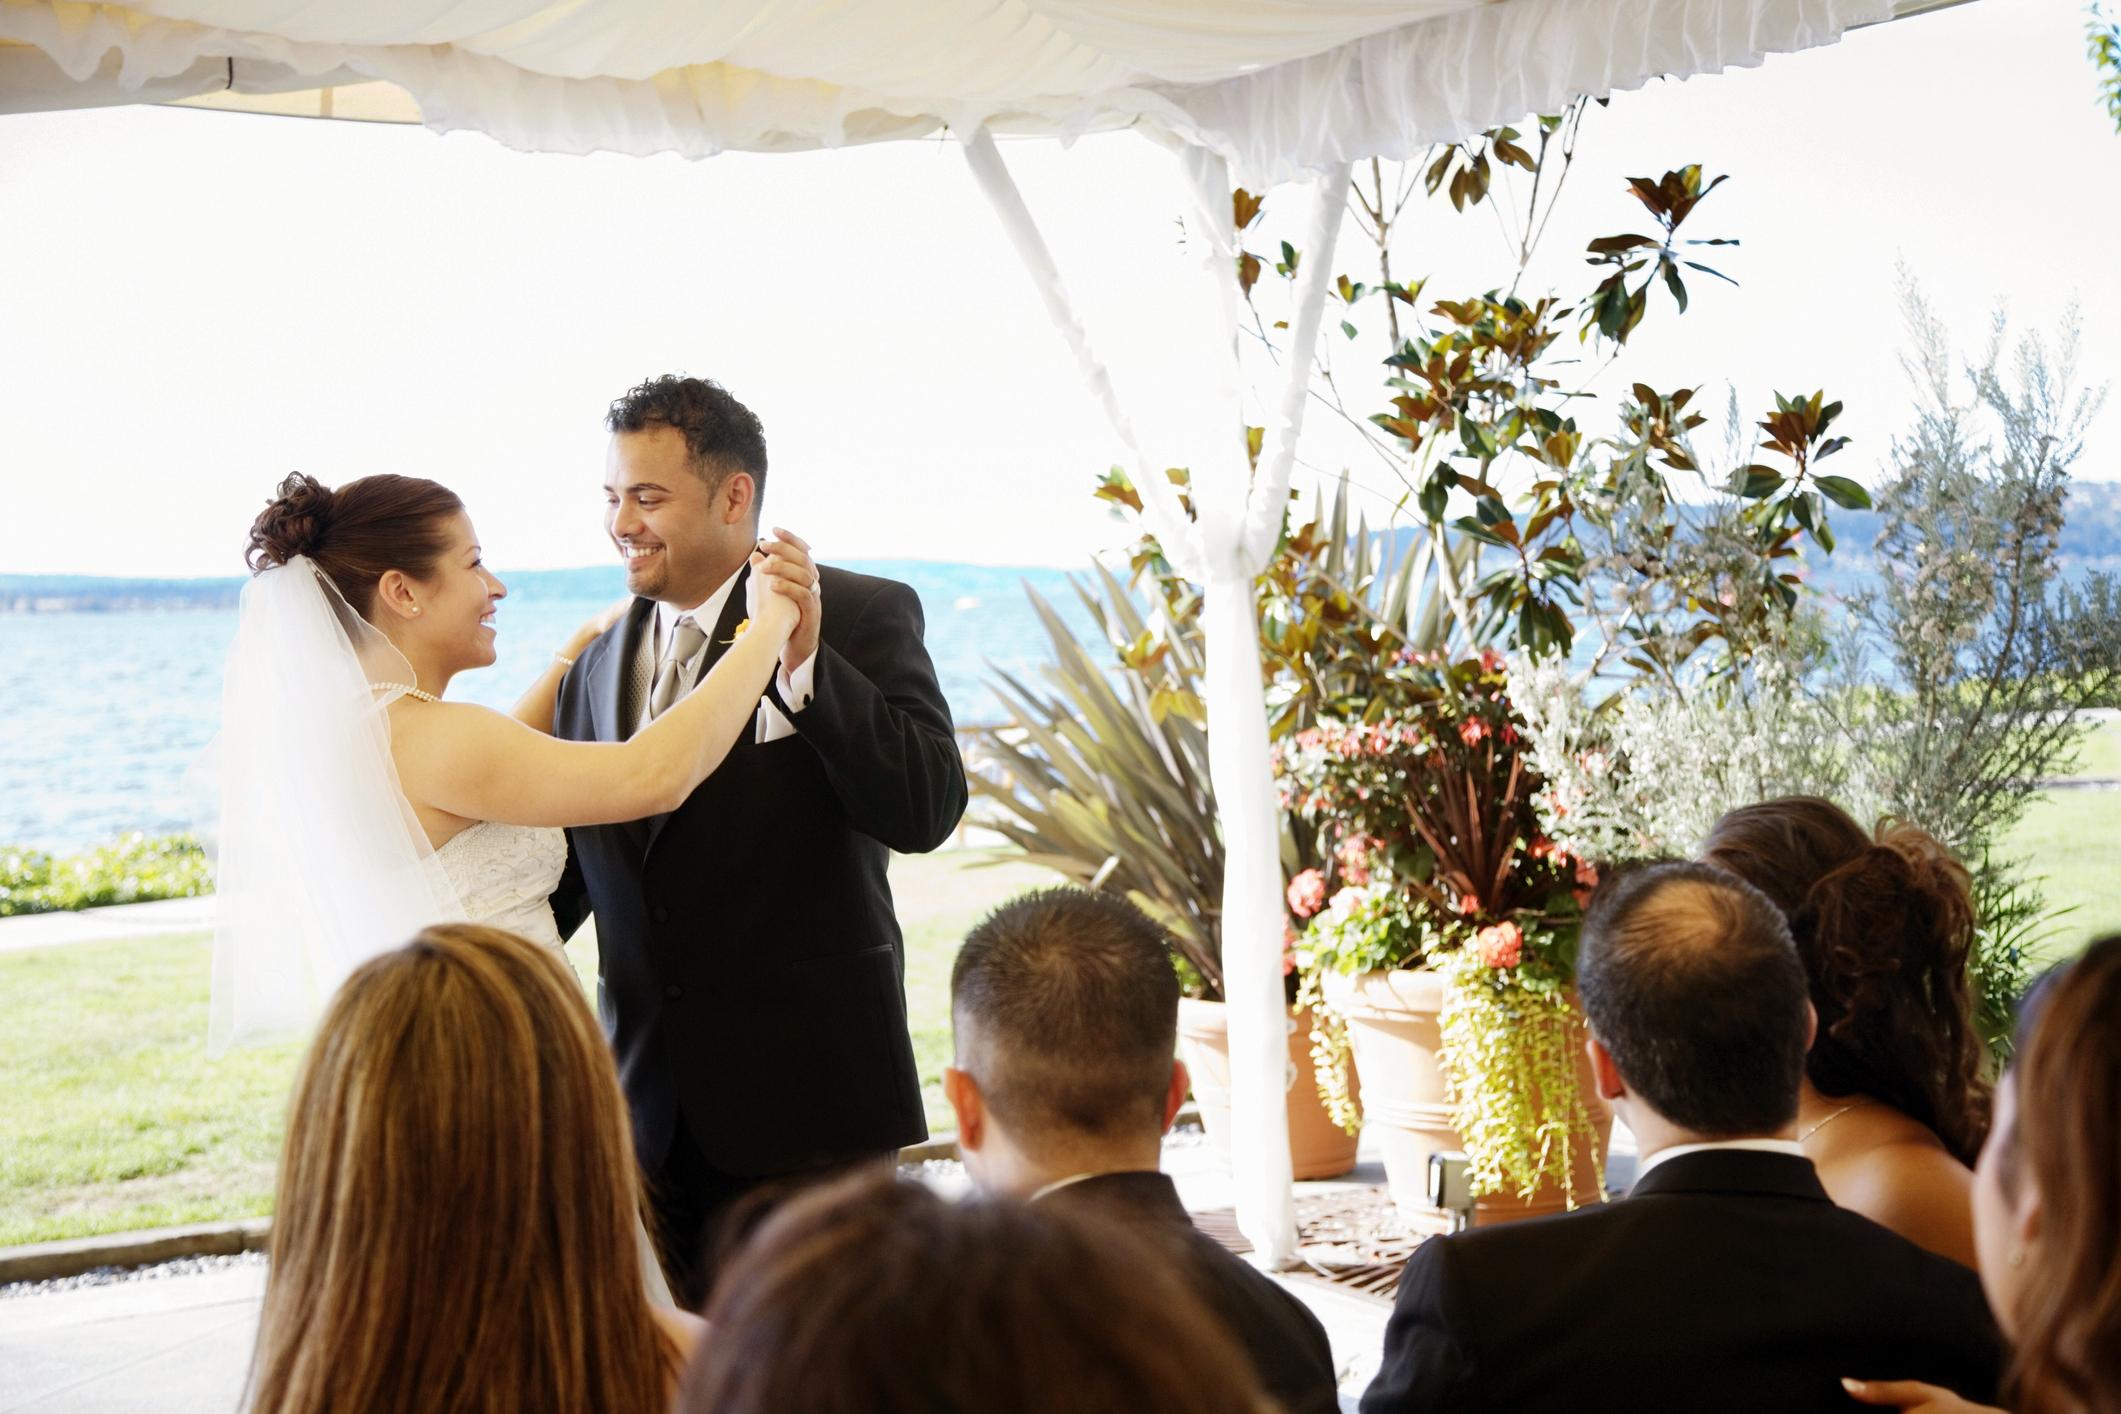 Beach Wedding Songs | LoveToKnow